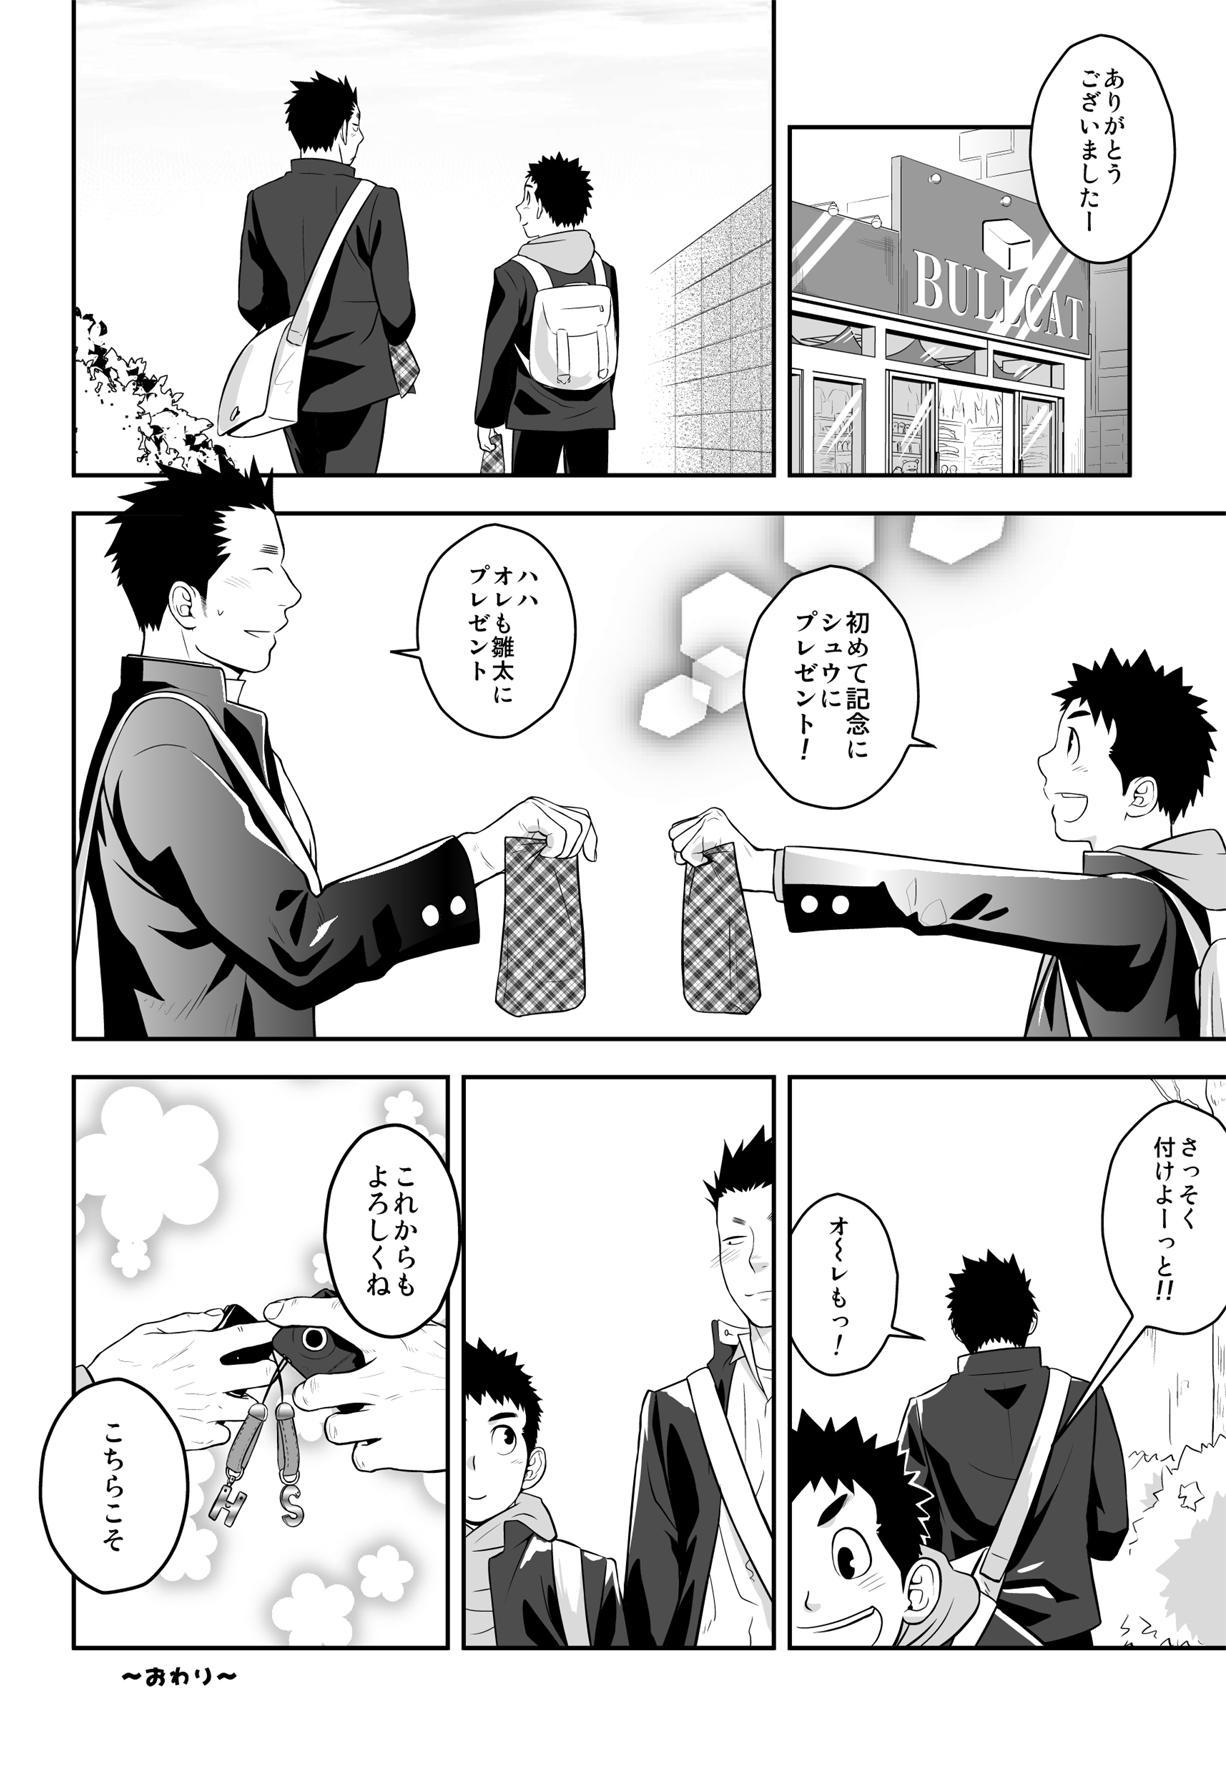 Present 25